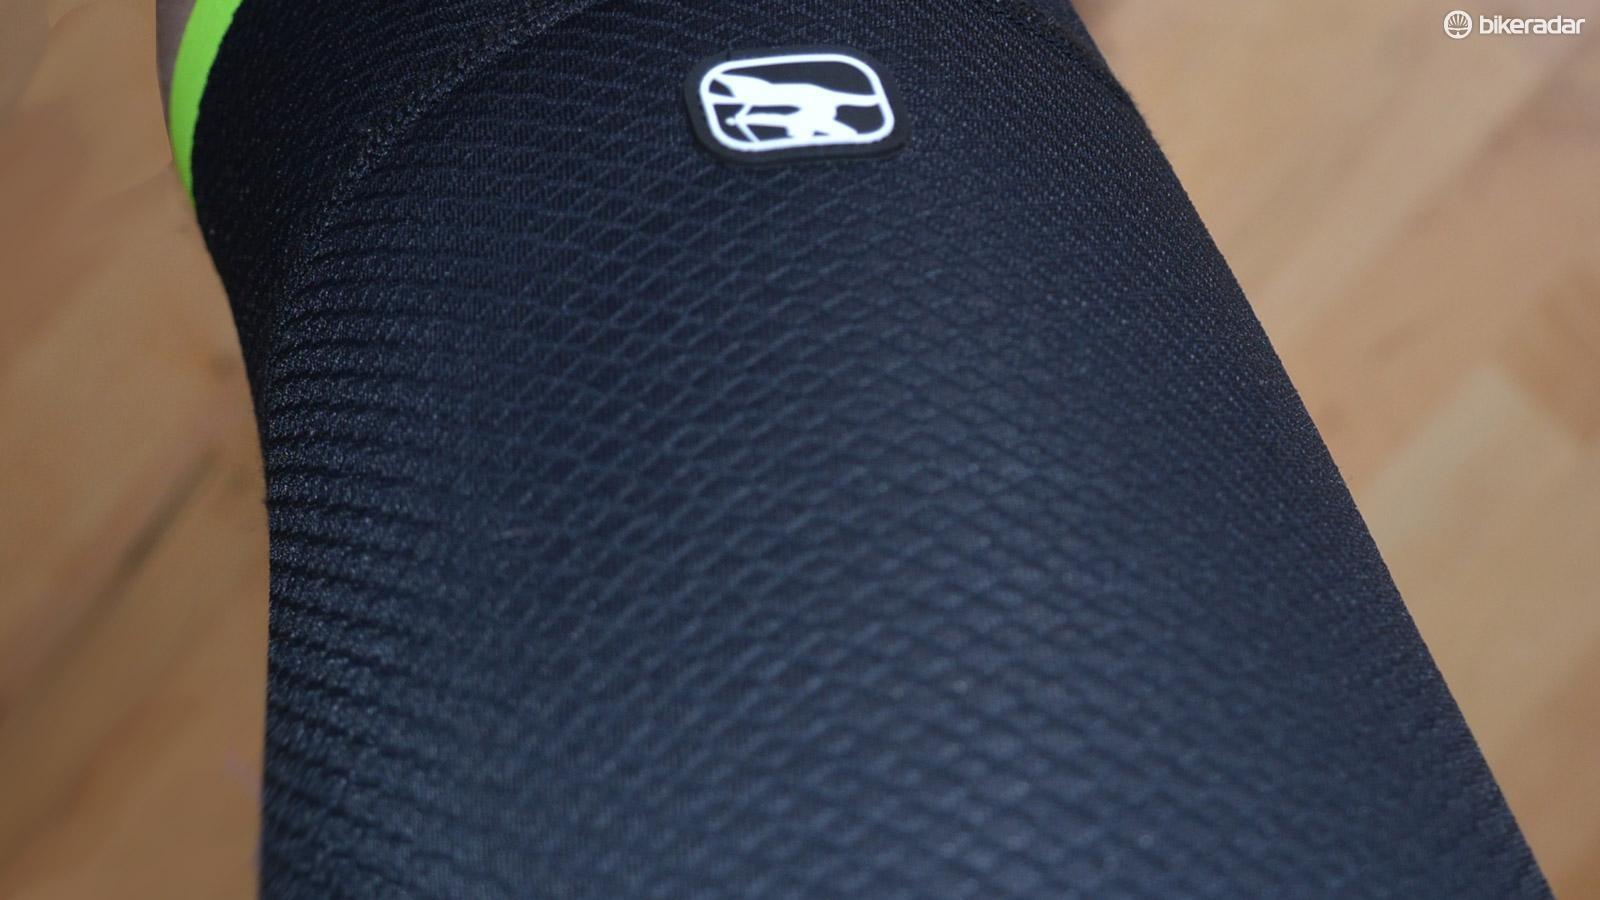 One panel and one seam per leg maximizes compression